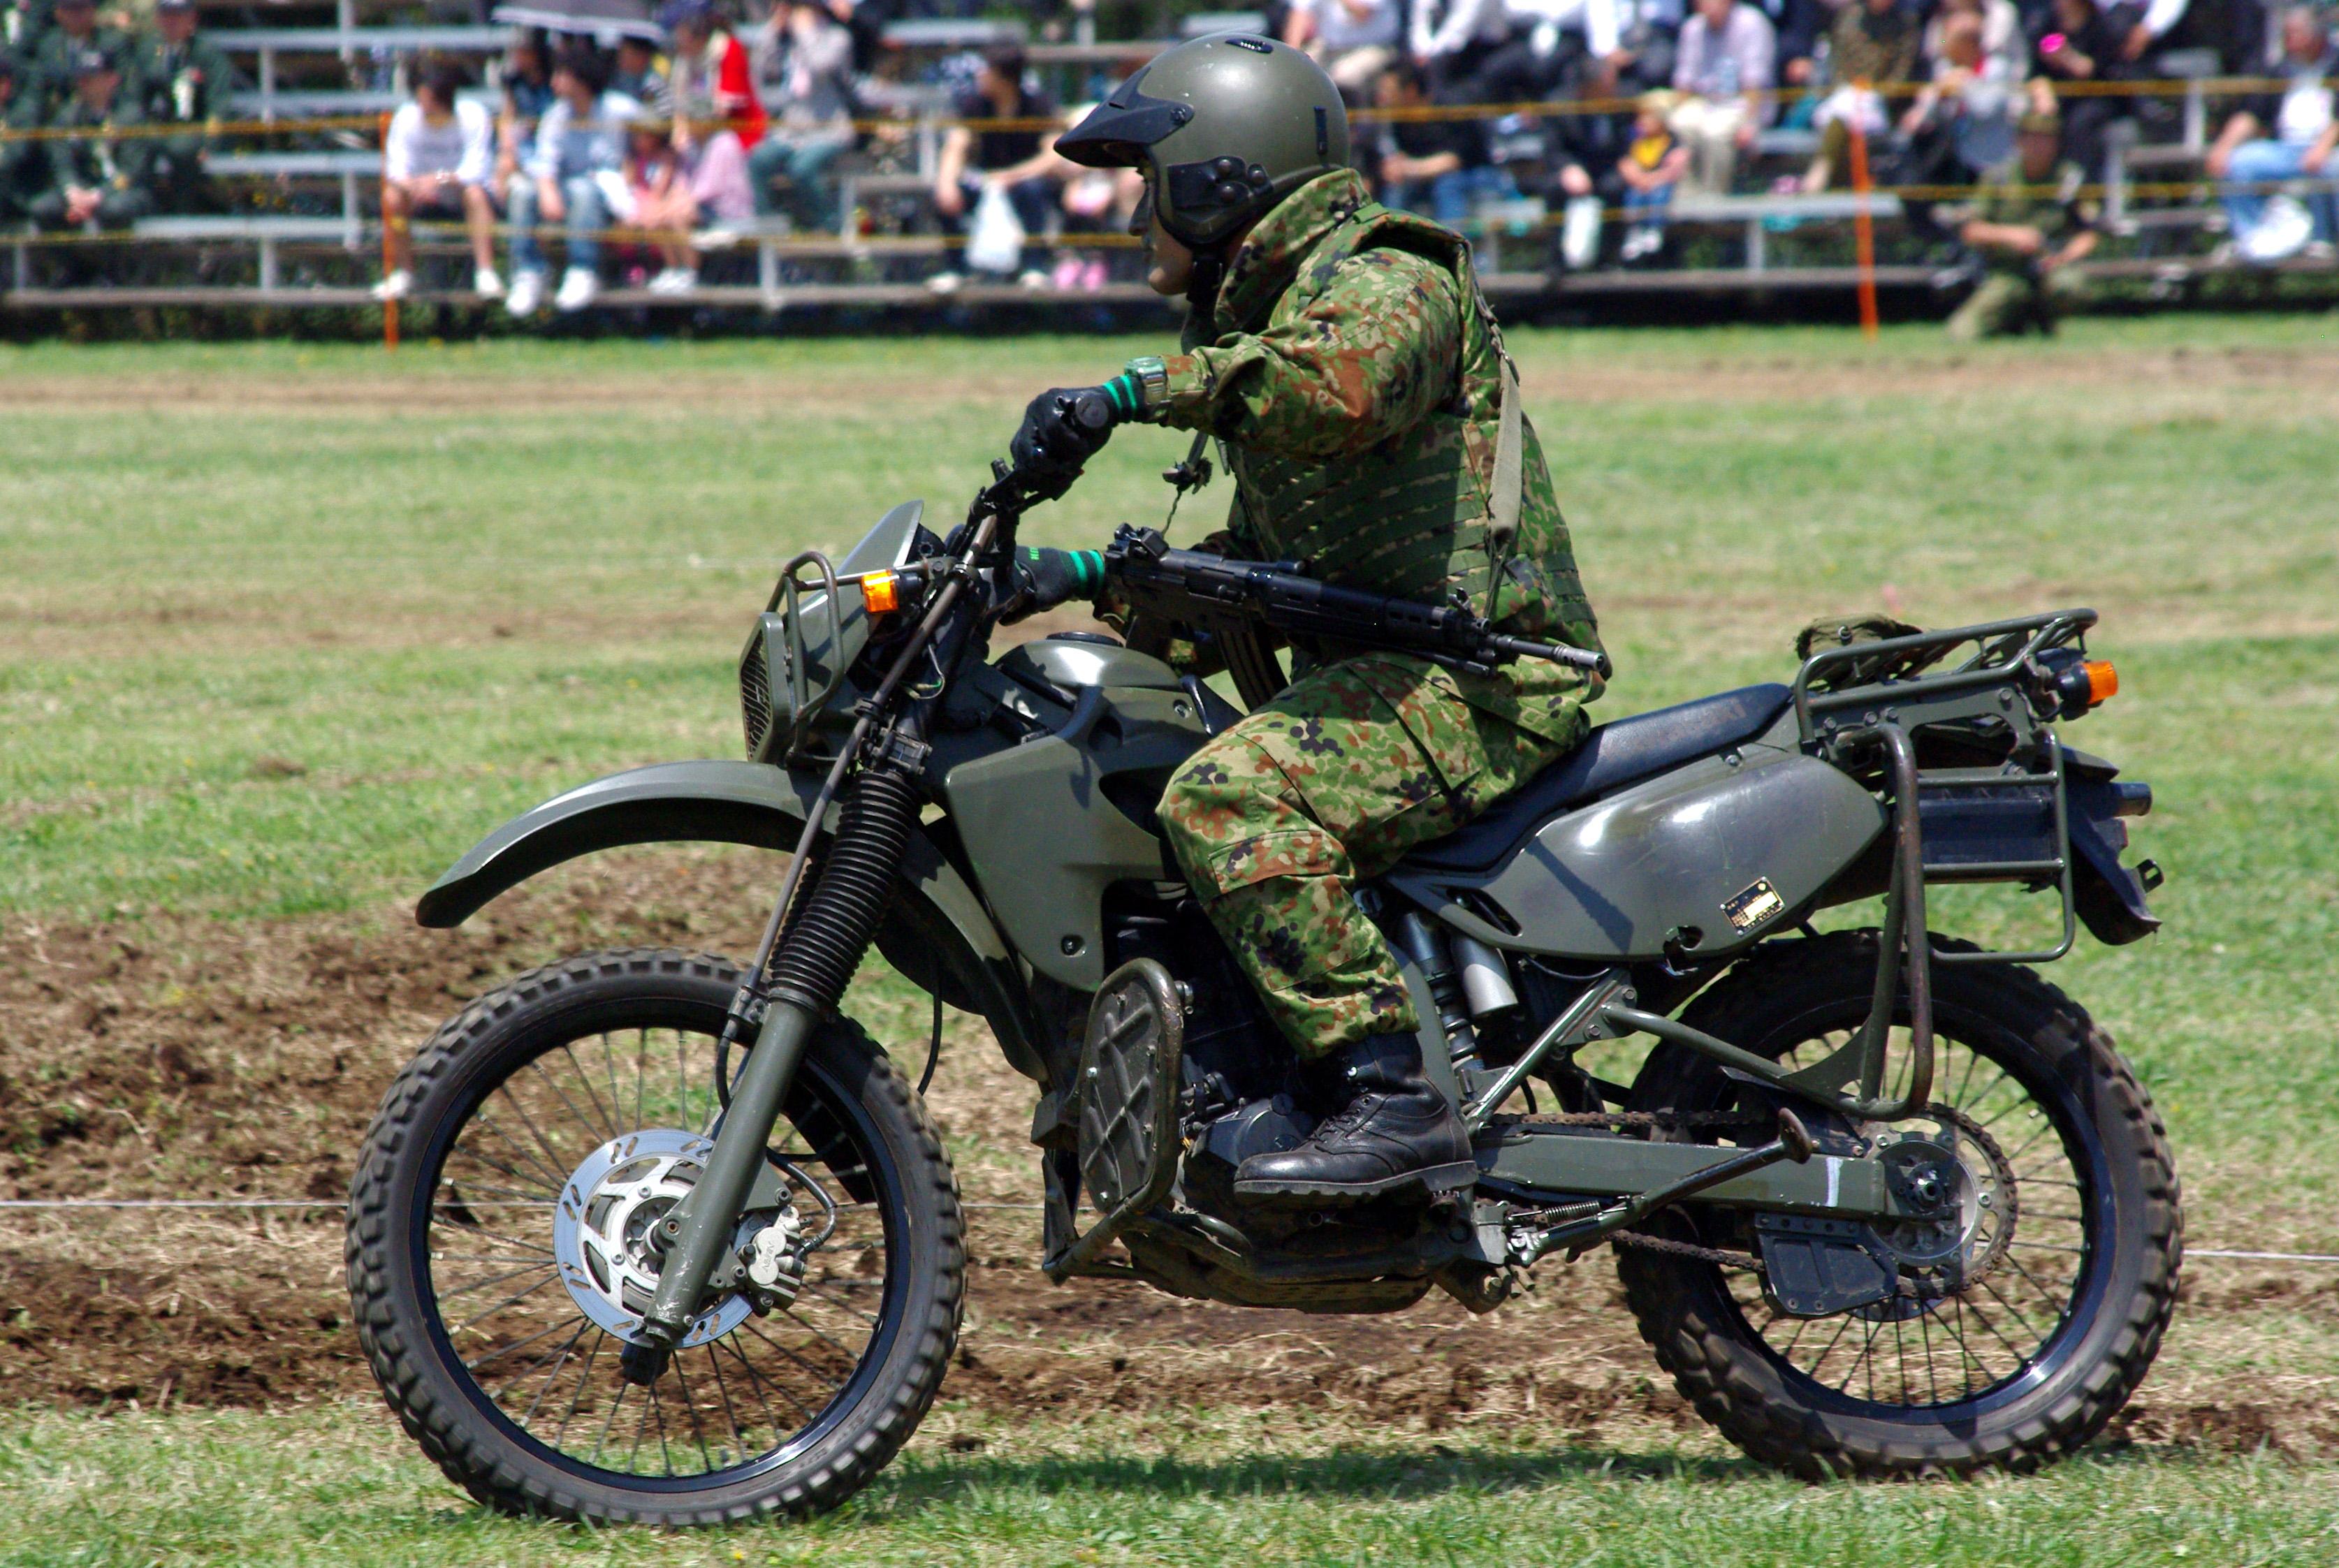 Kawasaki Dirt Bike Parts Online